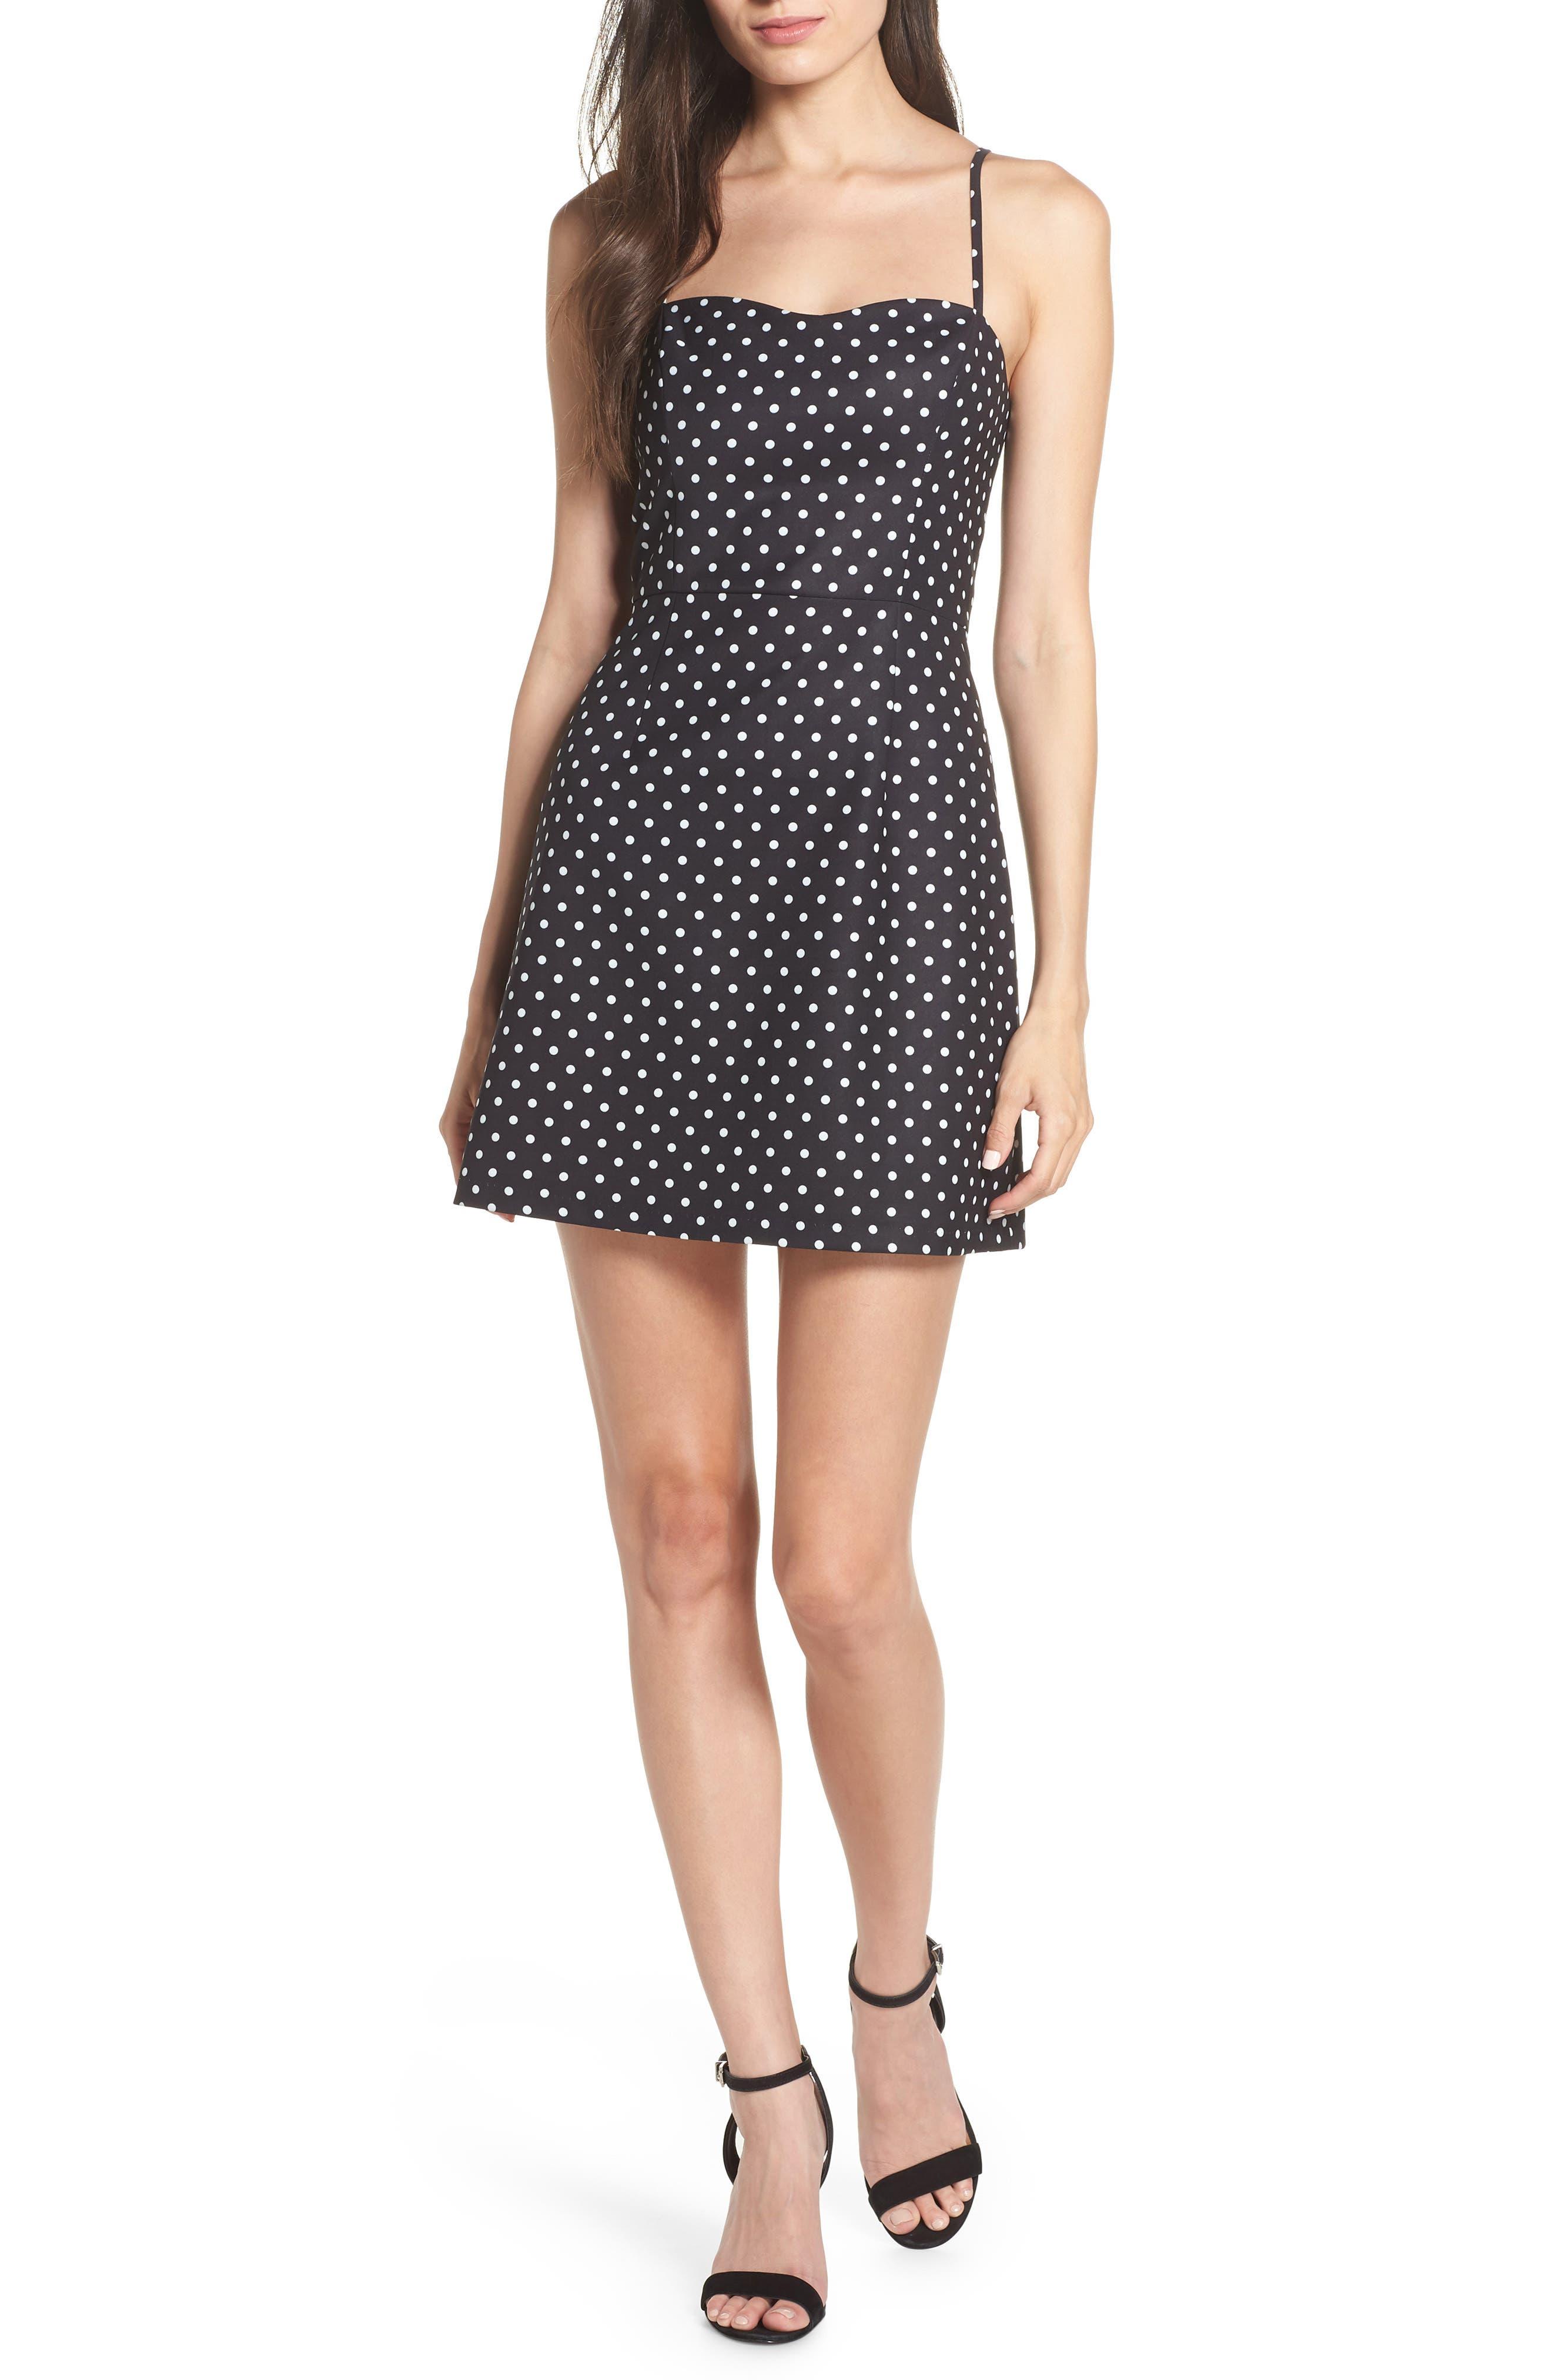 French Connection Whisper Polka Dot Dress